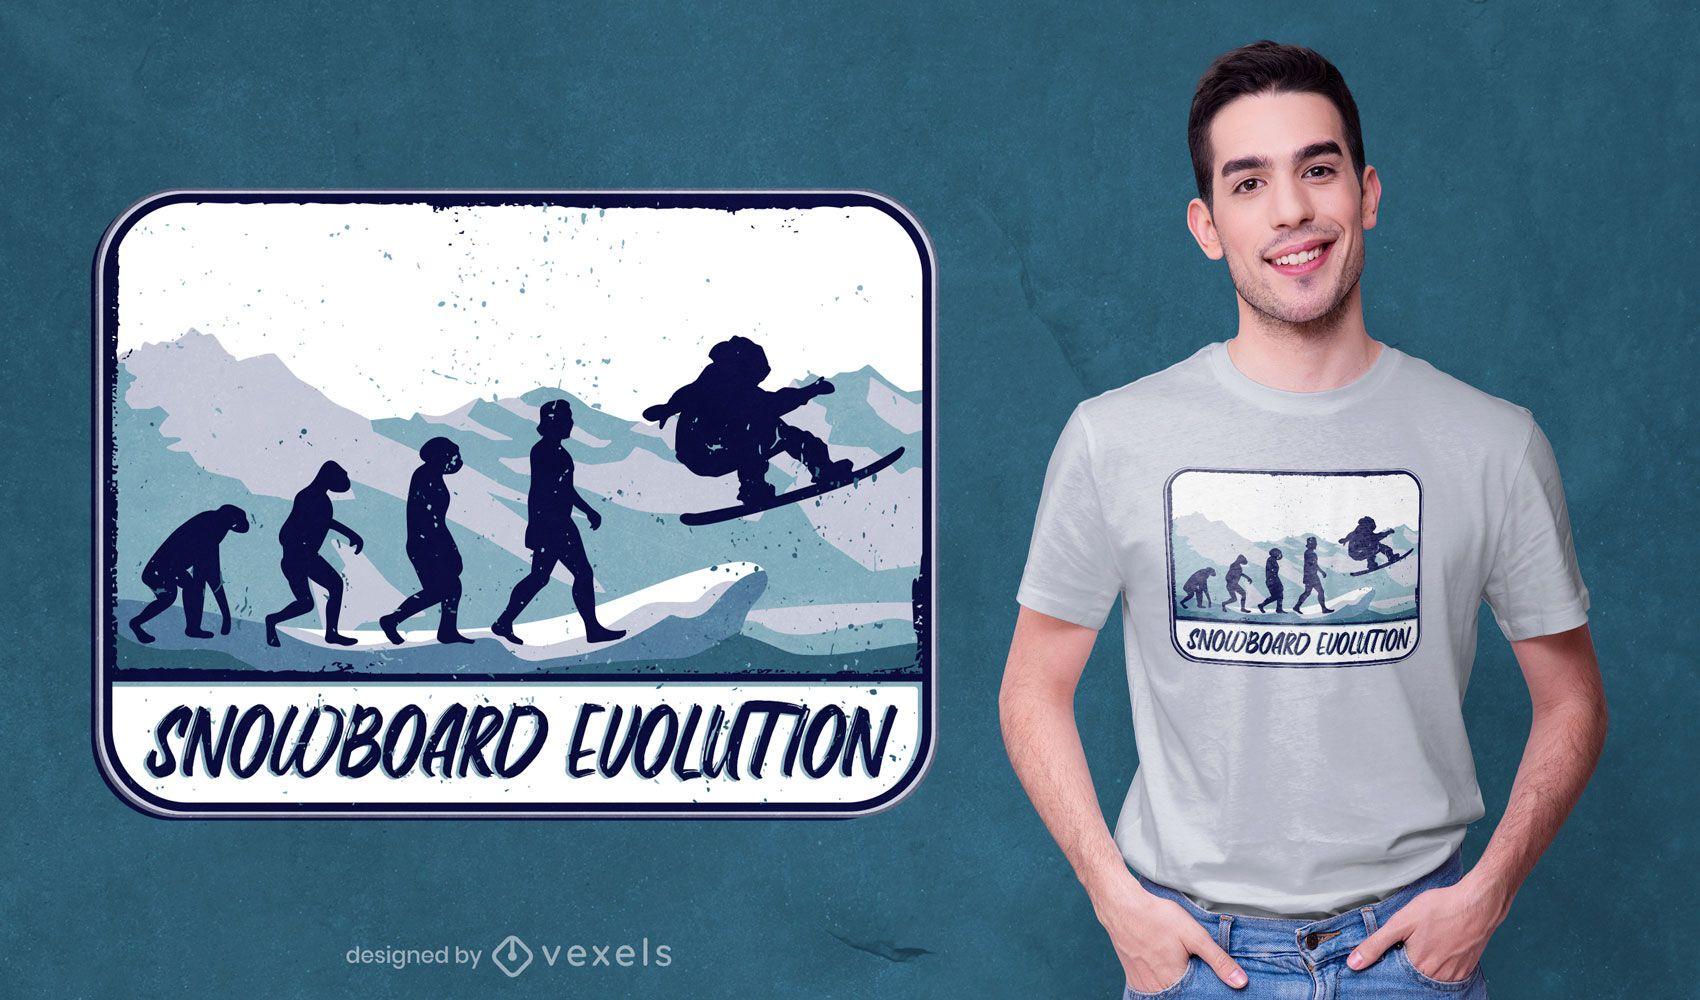 Snowboard evolution t-shirt design